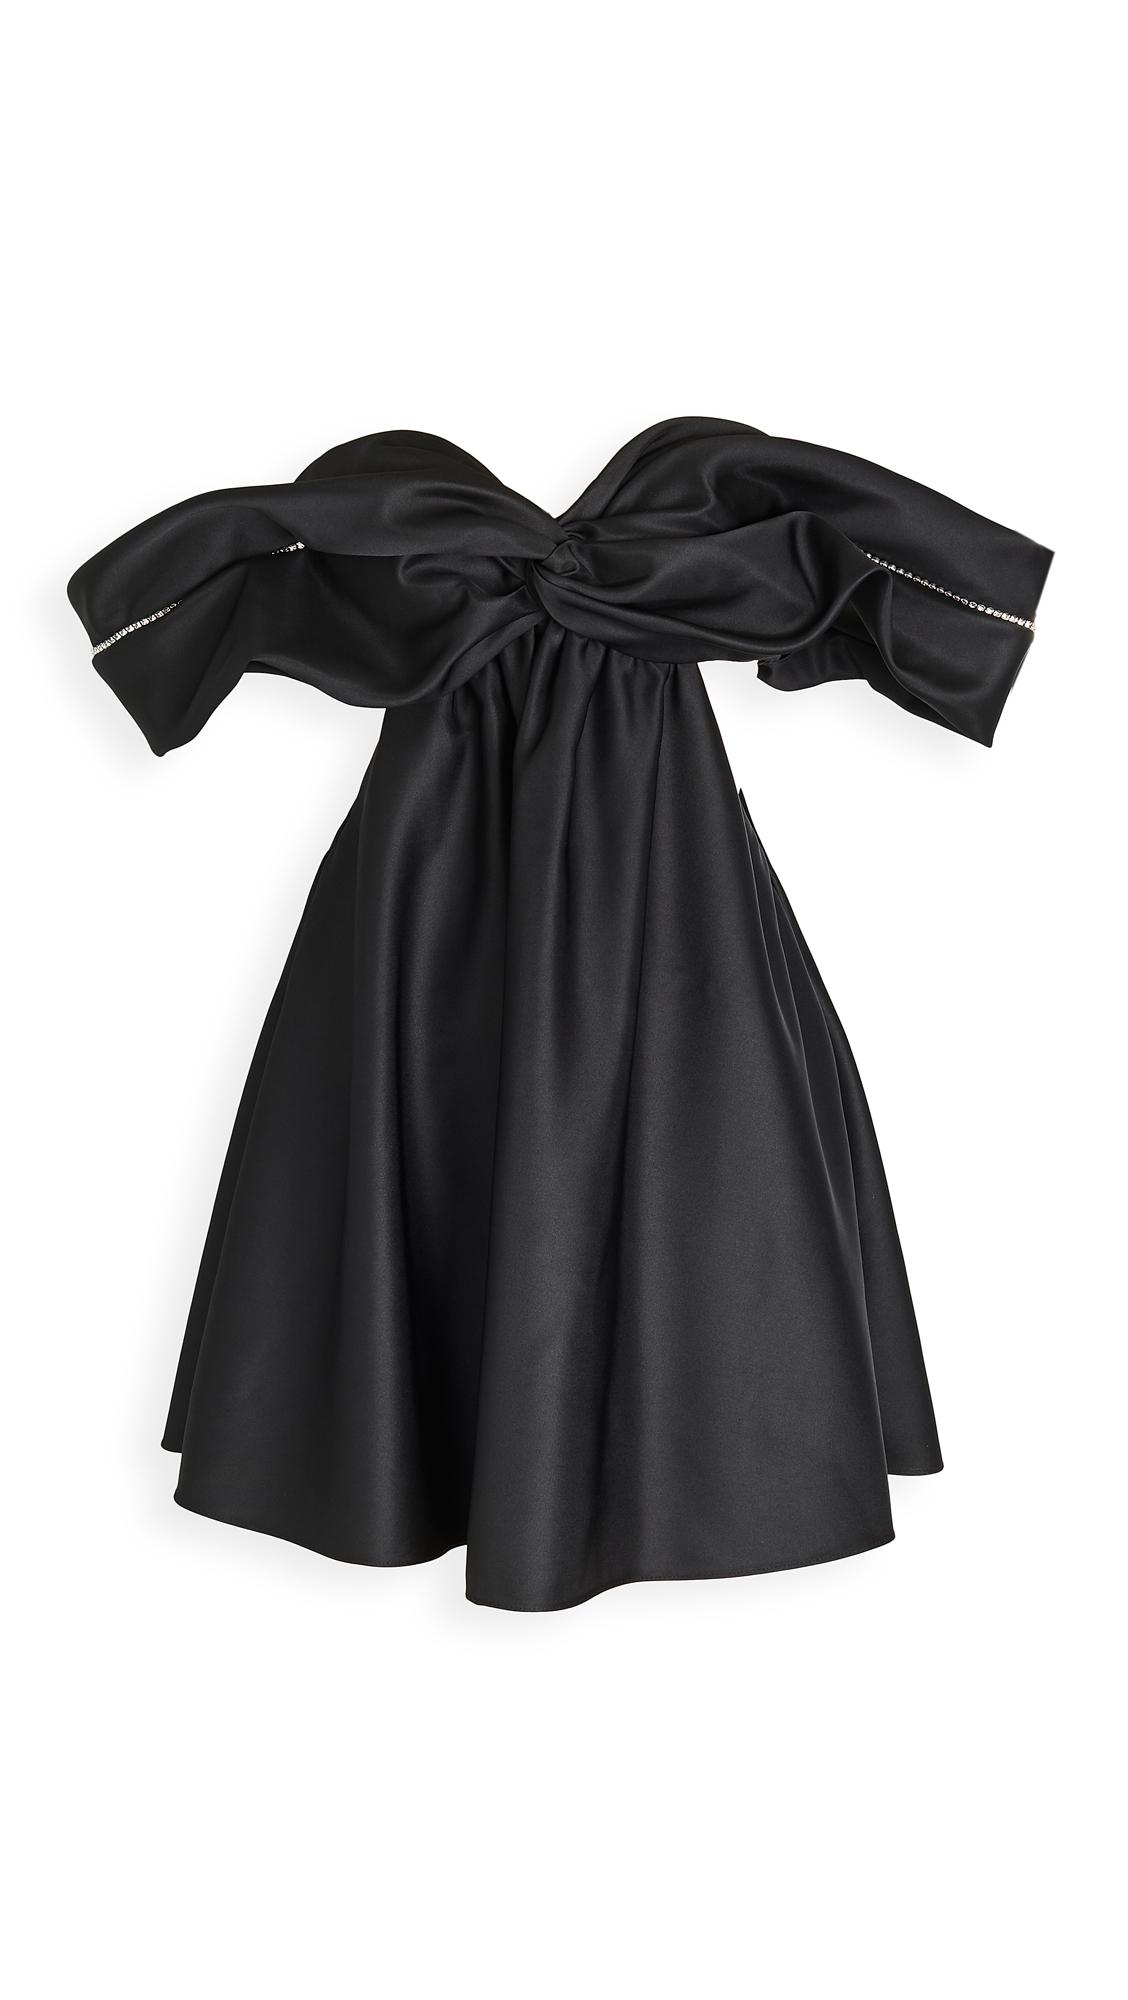 Area Crystal Cutout Draped Dress - 40% Off Sale